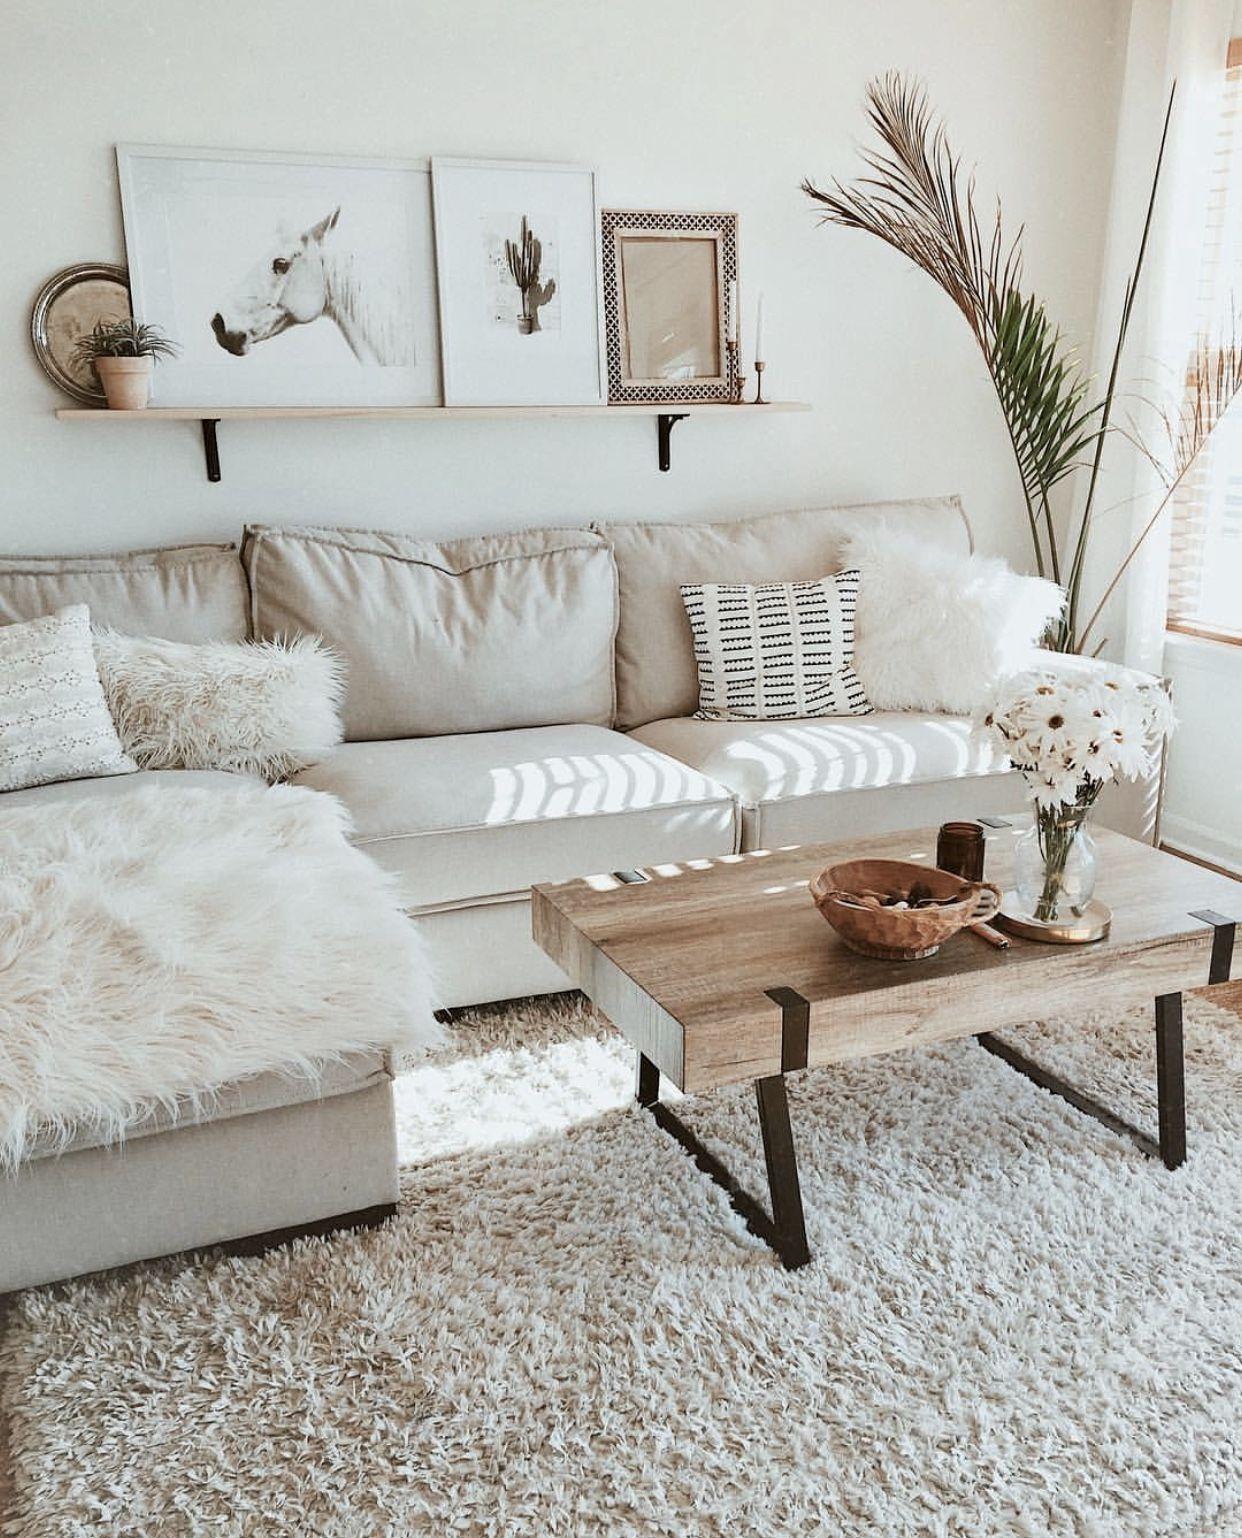 Quiet Home Furniture Colour #homeideas #LivingRoomFurnitureArrangementIdeas #beautifulhomes